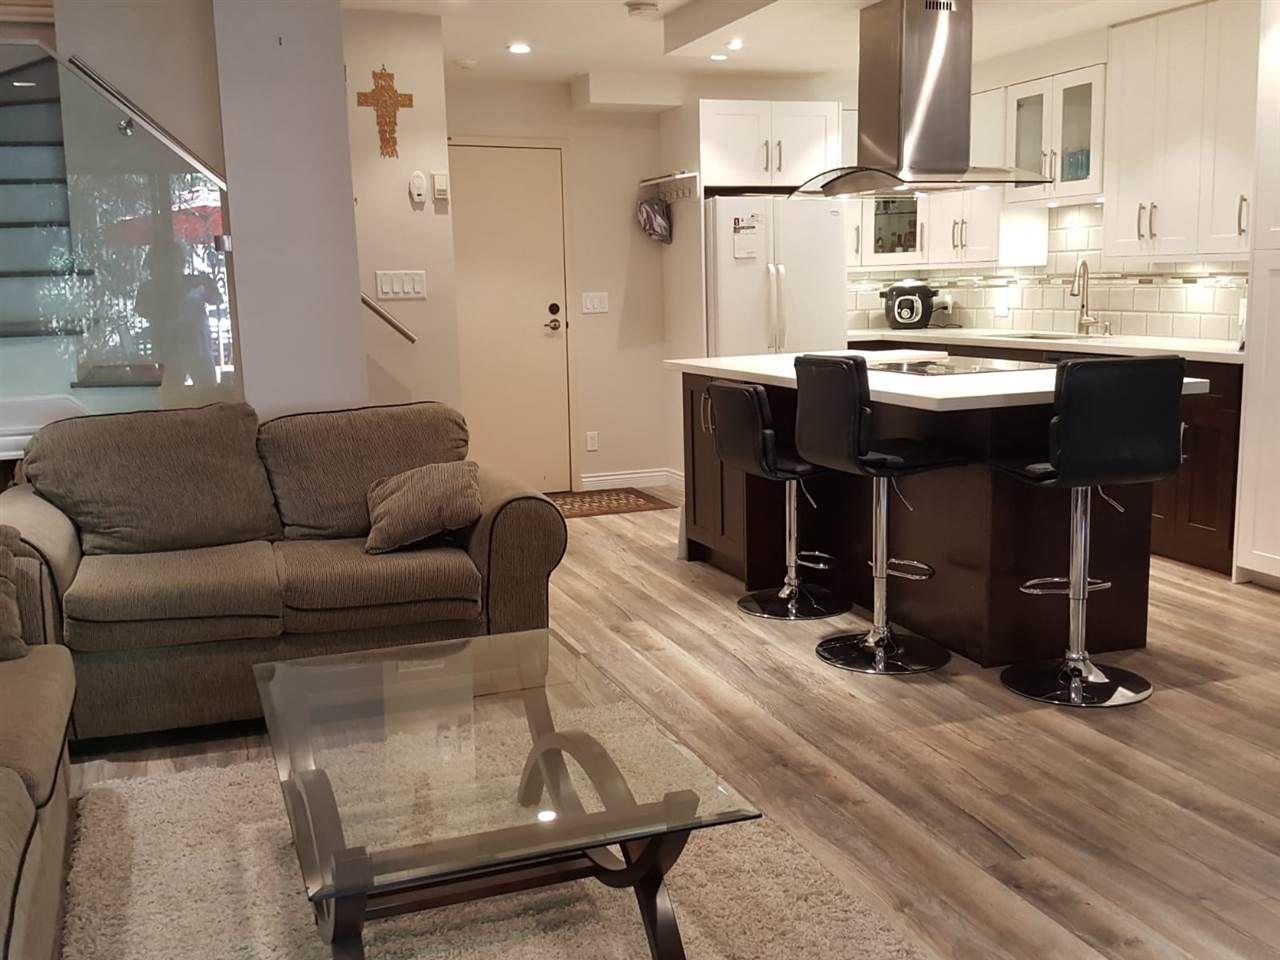 Main Photo: 121 1040 KING ALBERT Avenue in Coquitlam: Central Coquitlam Condo for sale : MLS®# R2391535